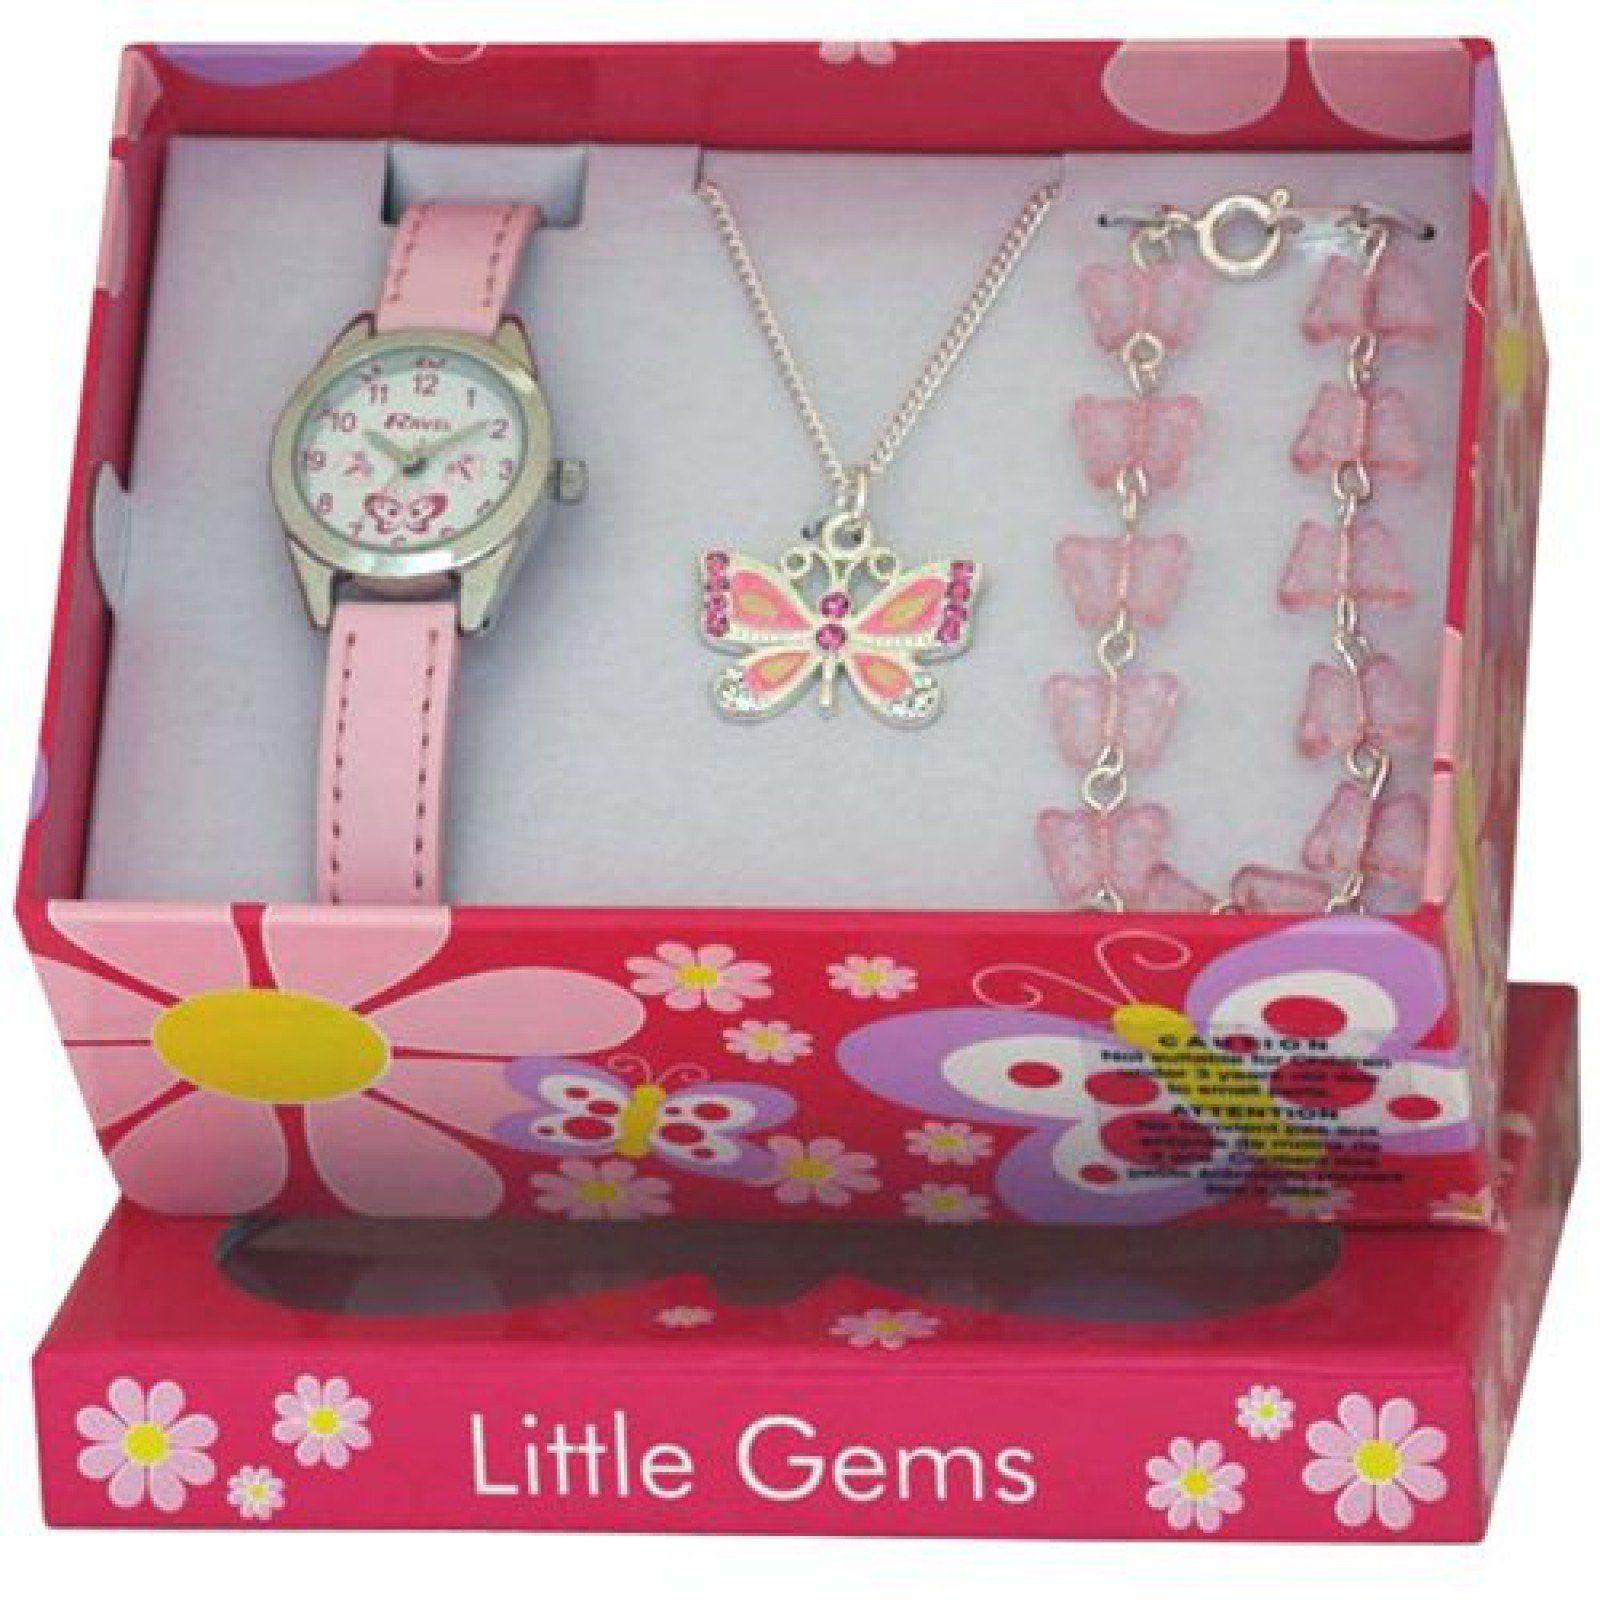 Ravel Little Gems Kids Butterfly Watch & Jewellery Gift Set For